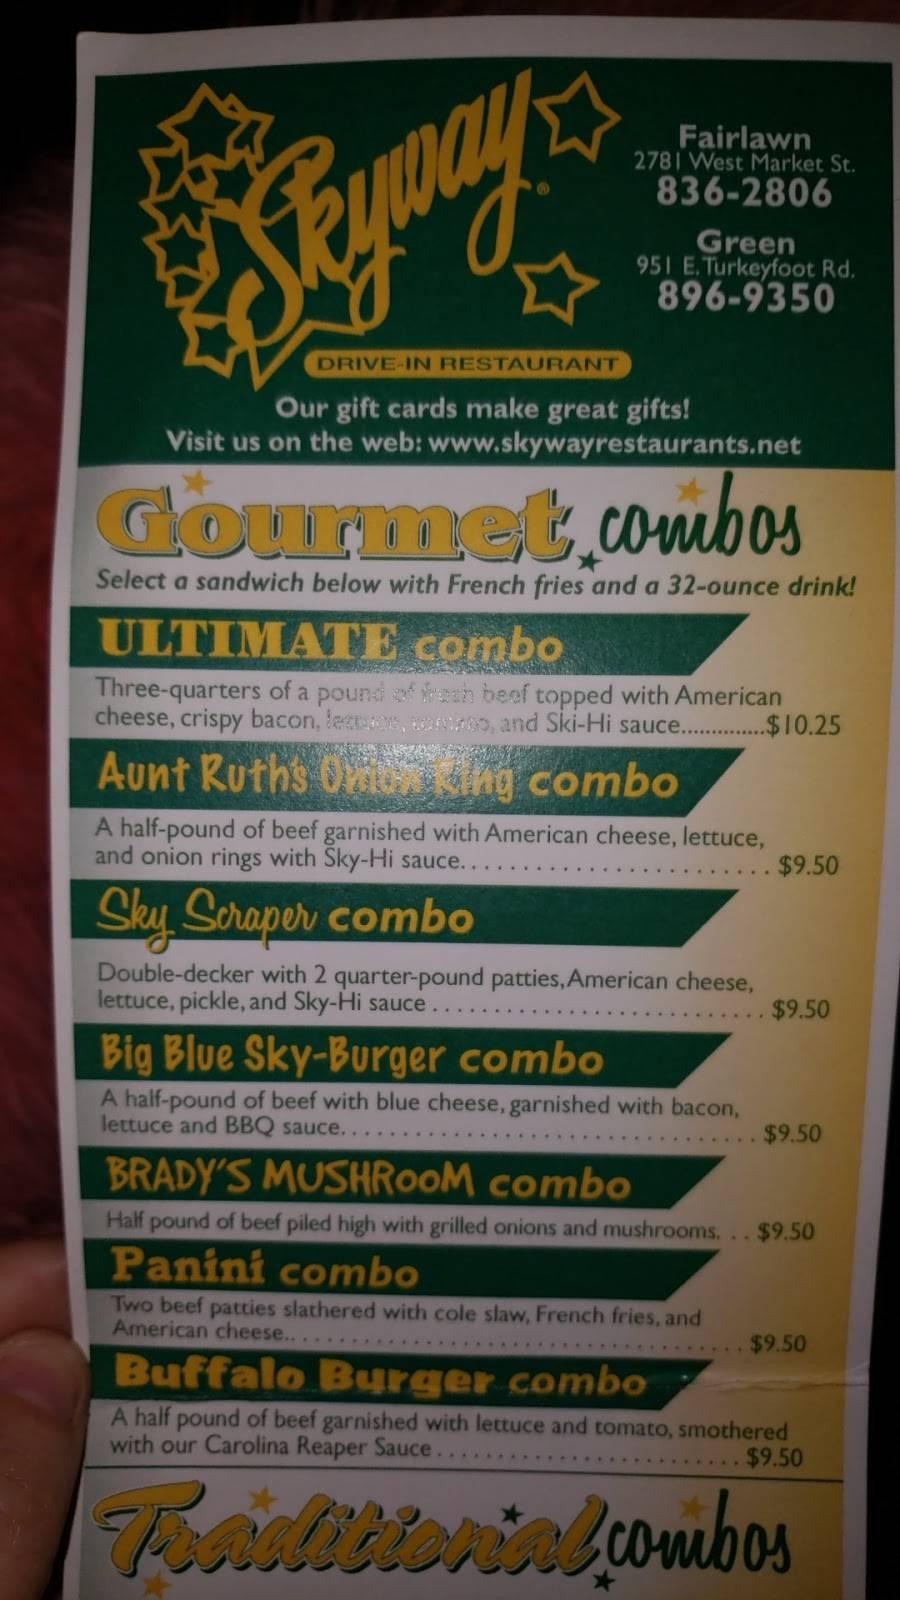 Skyway | restaurant | 2781 W Market St, Fairlawn, OH 44333, USA | 3308362806 OR +1 330-836-2806